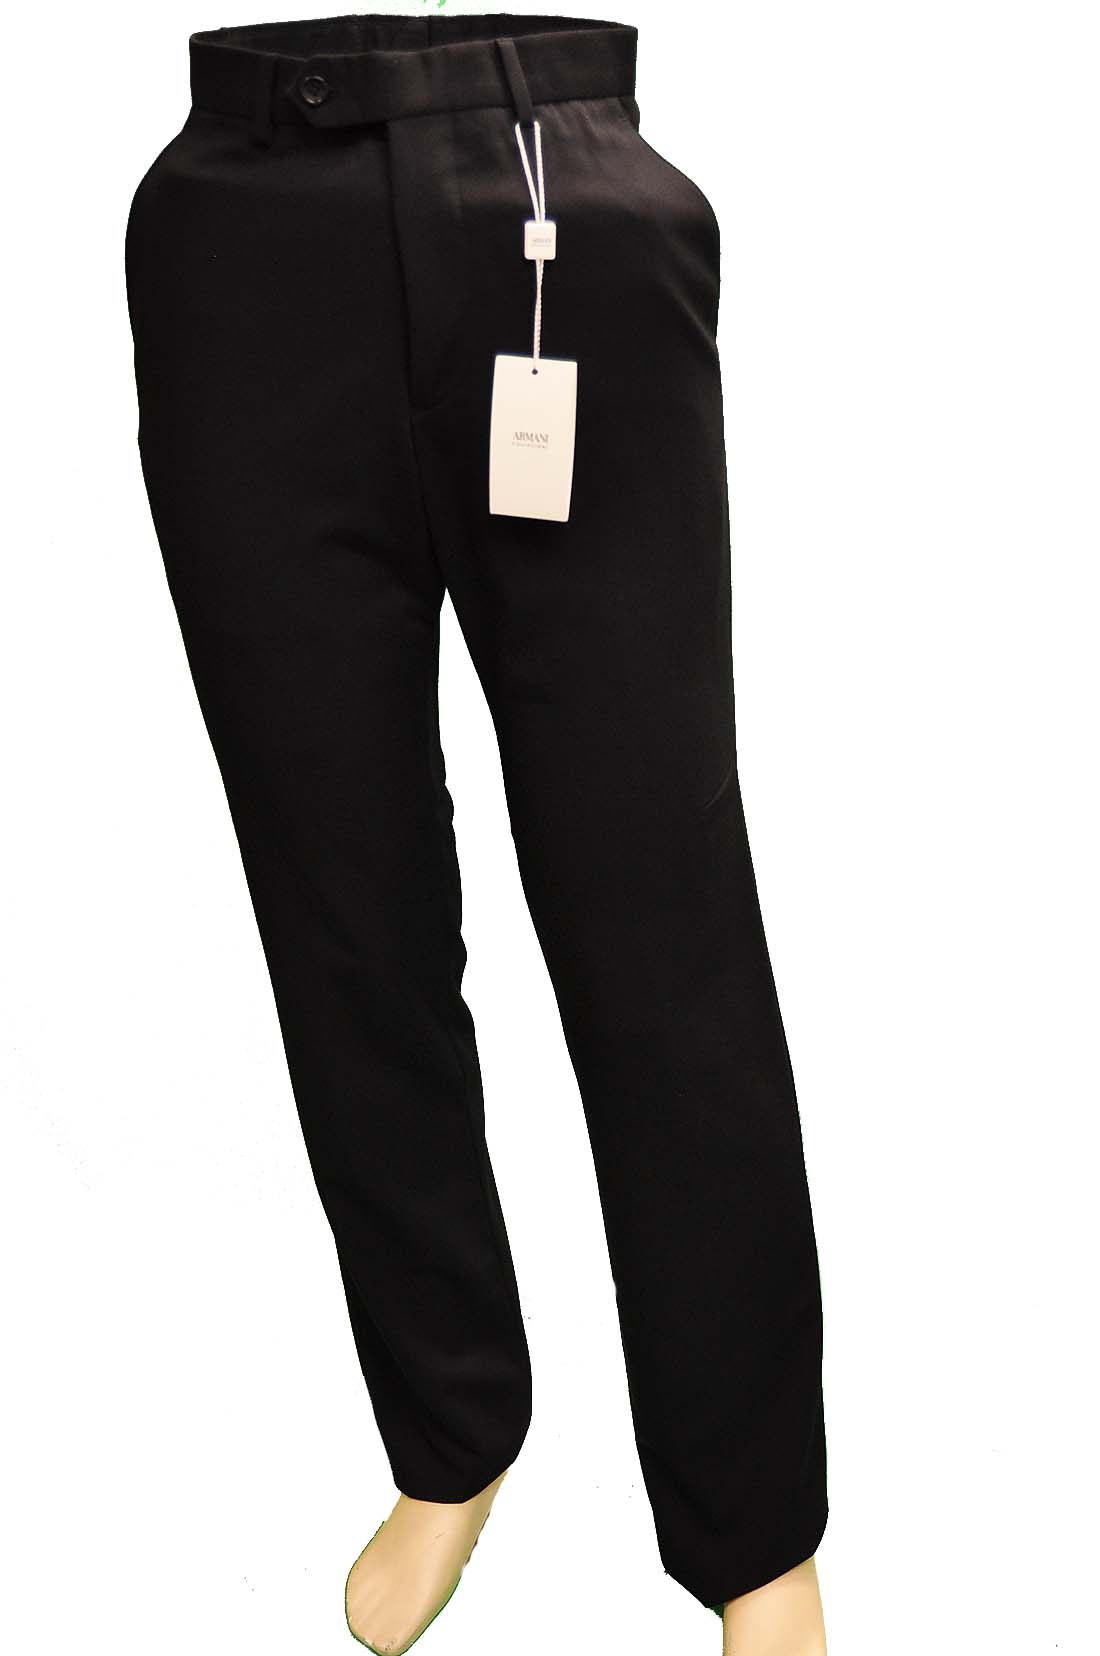 Armani Collezioni BLACK Polyester Pants Trousers